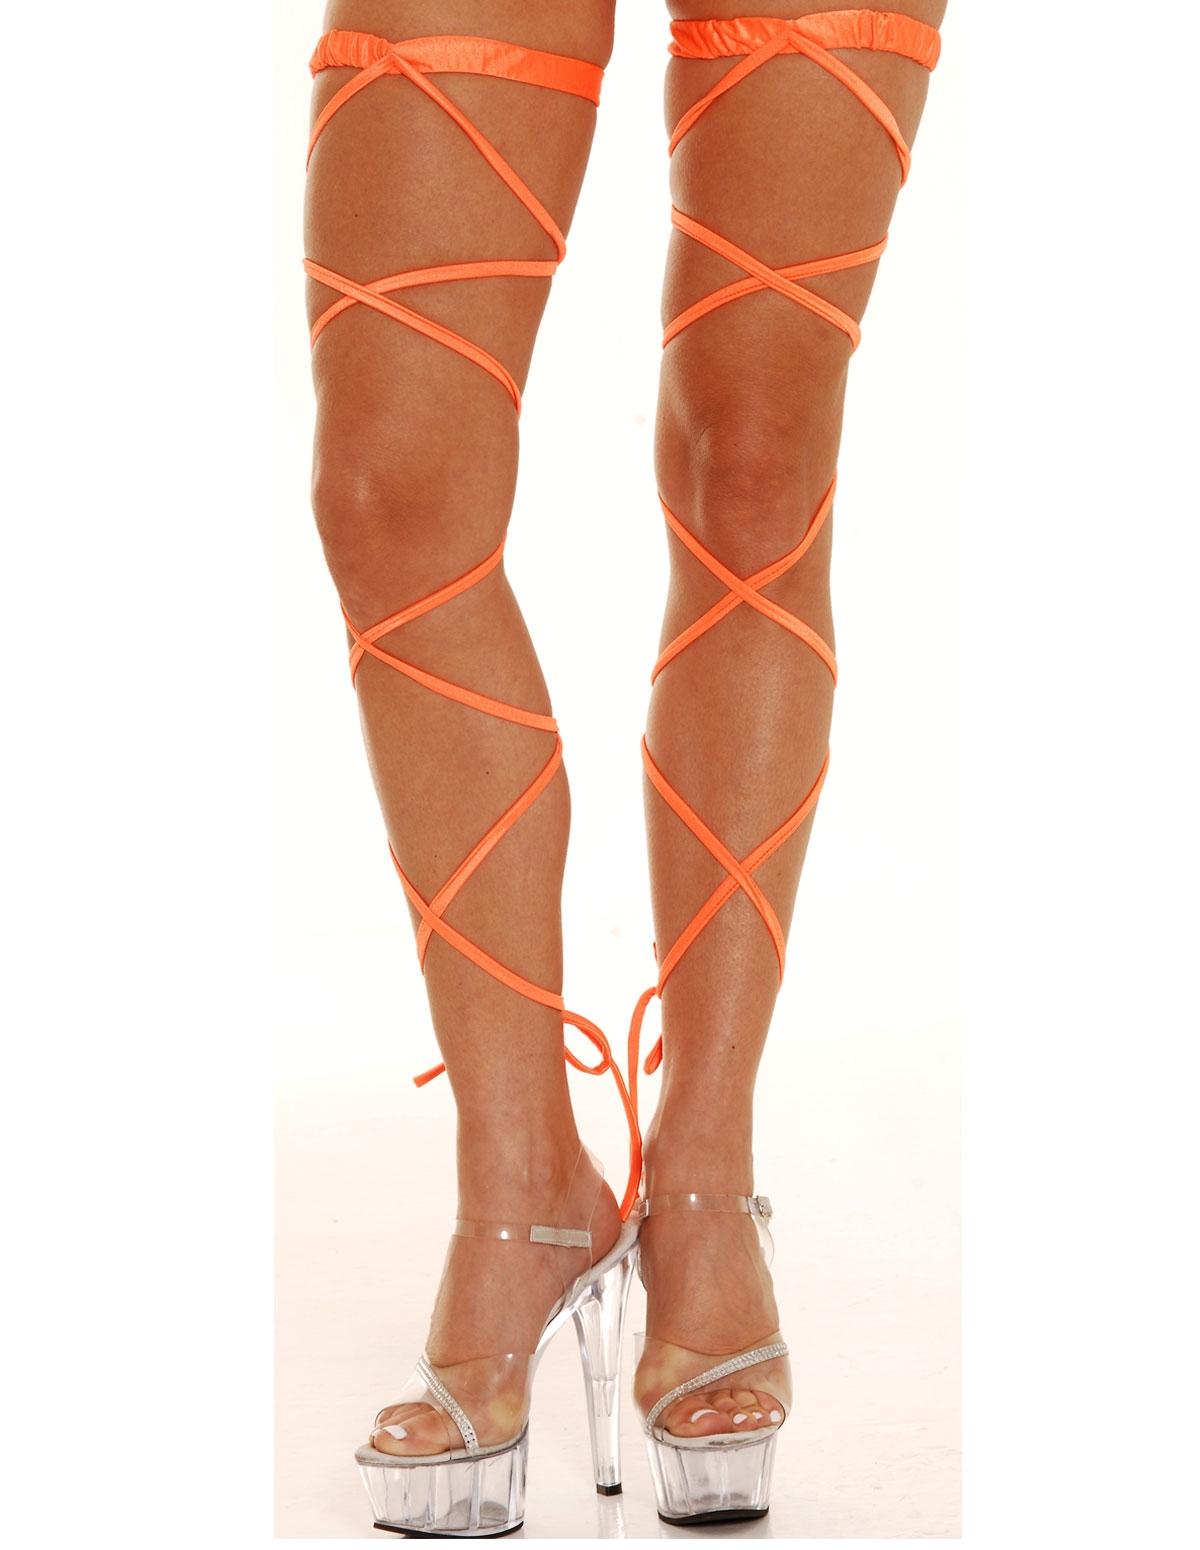 Leg Gartini